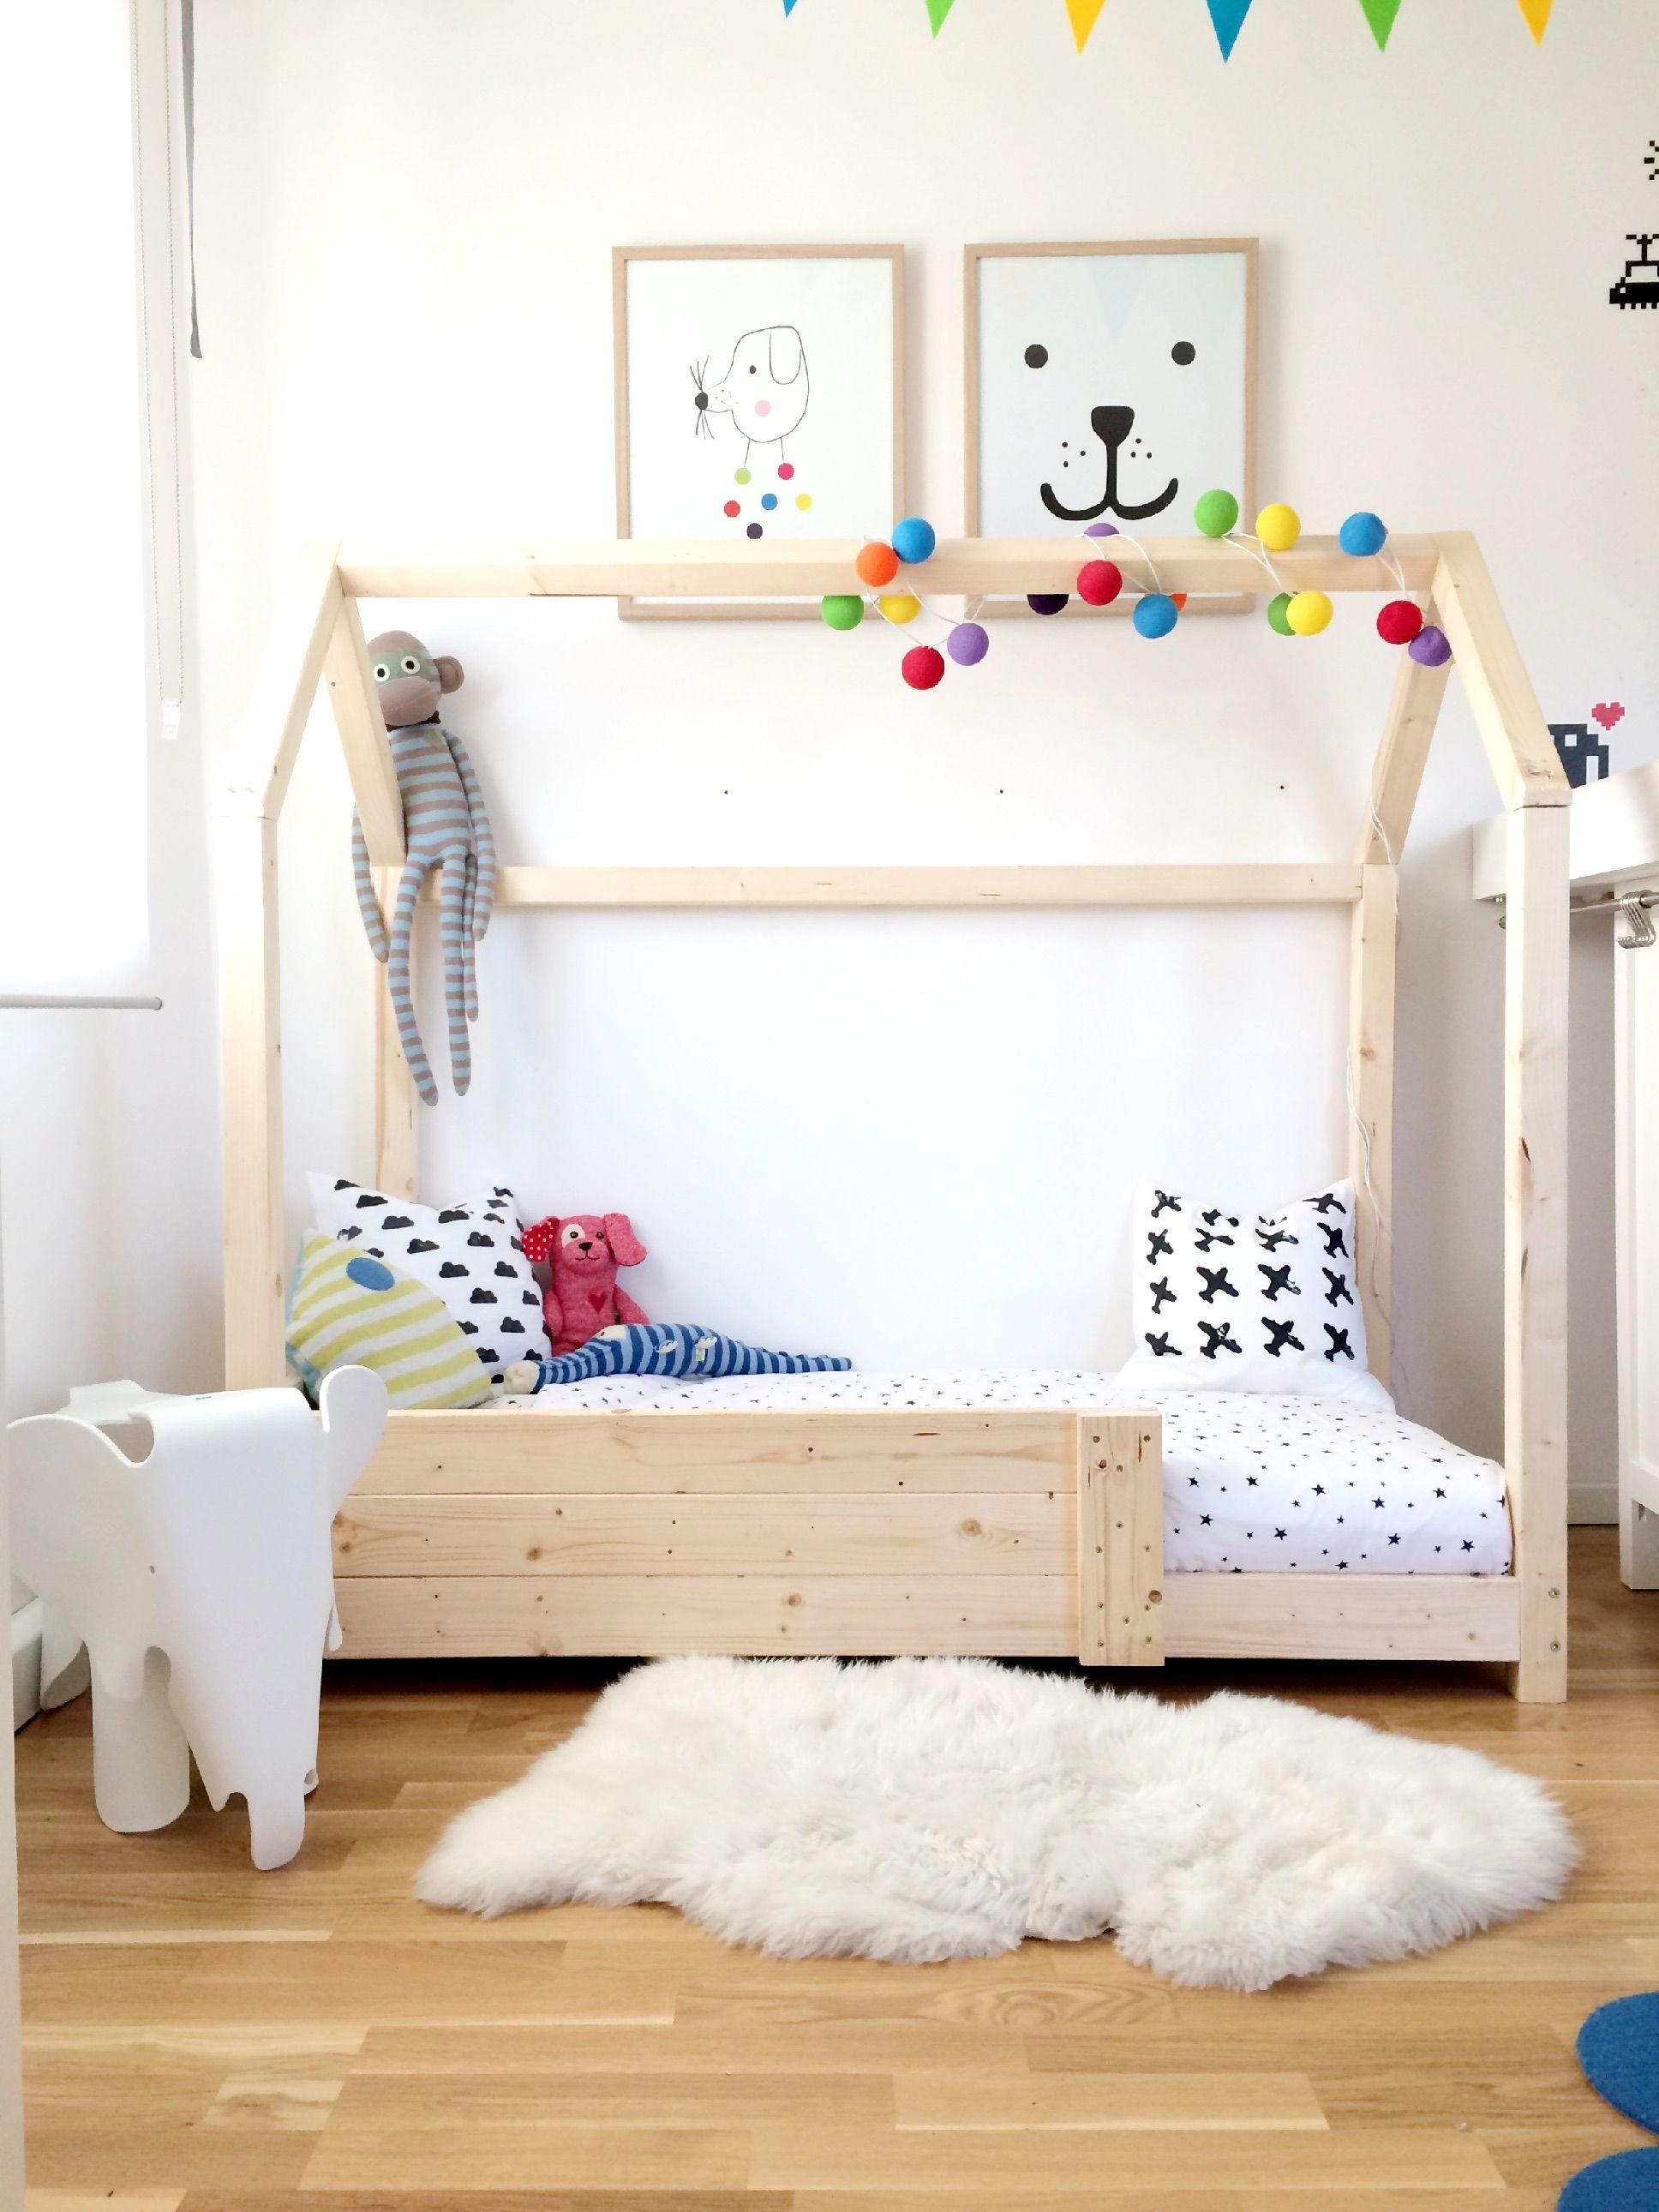 diy h uschenbett pinterest chambres chambre enfant et lit cabane. Black Bedroom Furniture Sets. Home Design Ideas